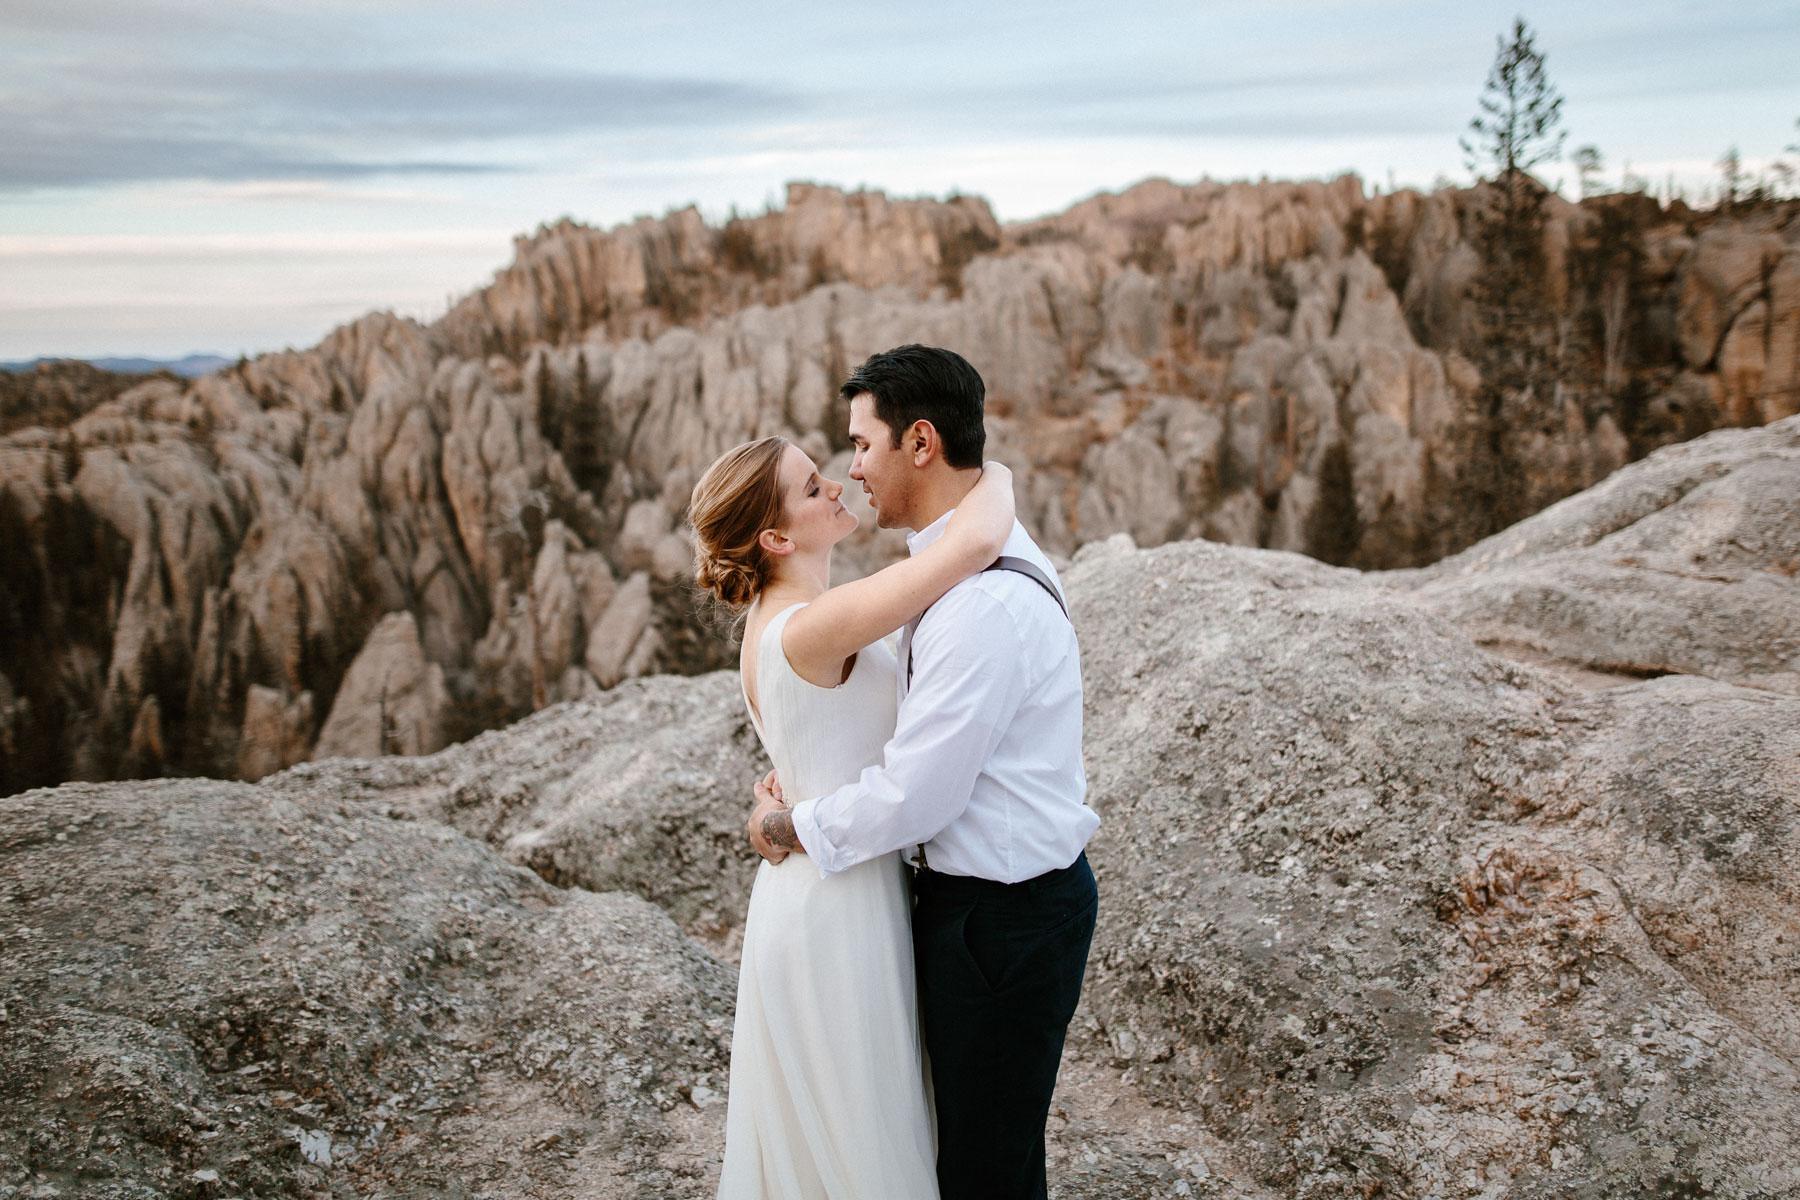 sioux-falls-black-hills-rapid-city-elopement-wedding-adventure-photographer-custer-sylvan-lake-44.jpg